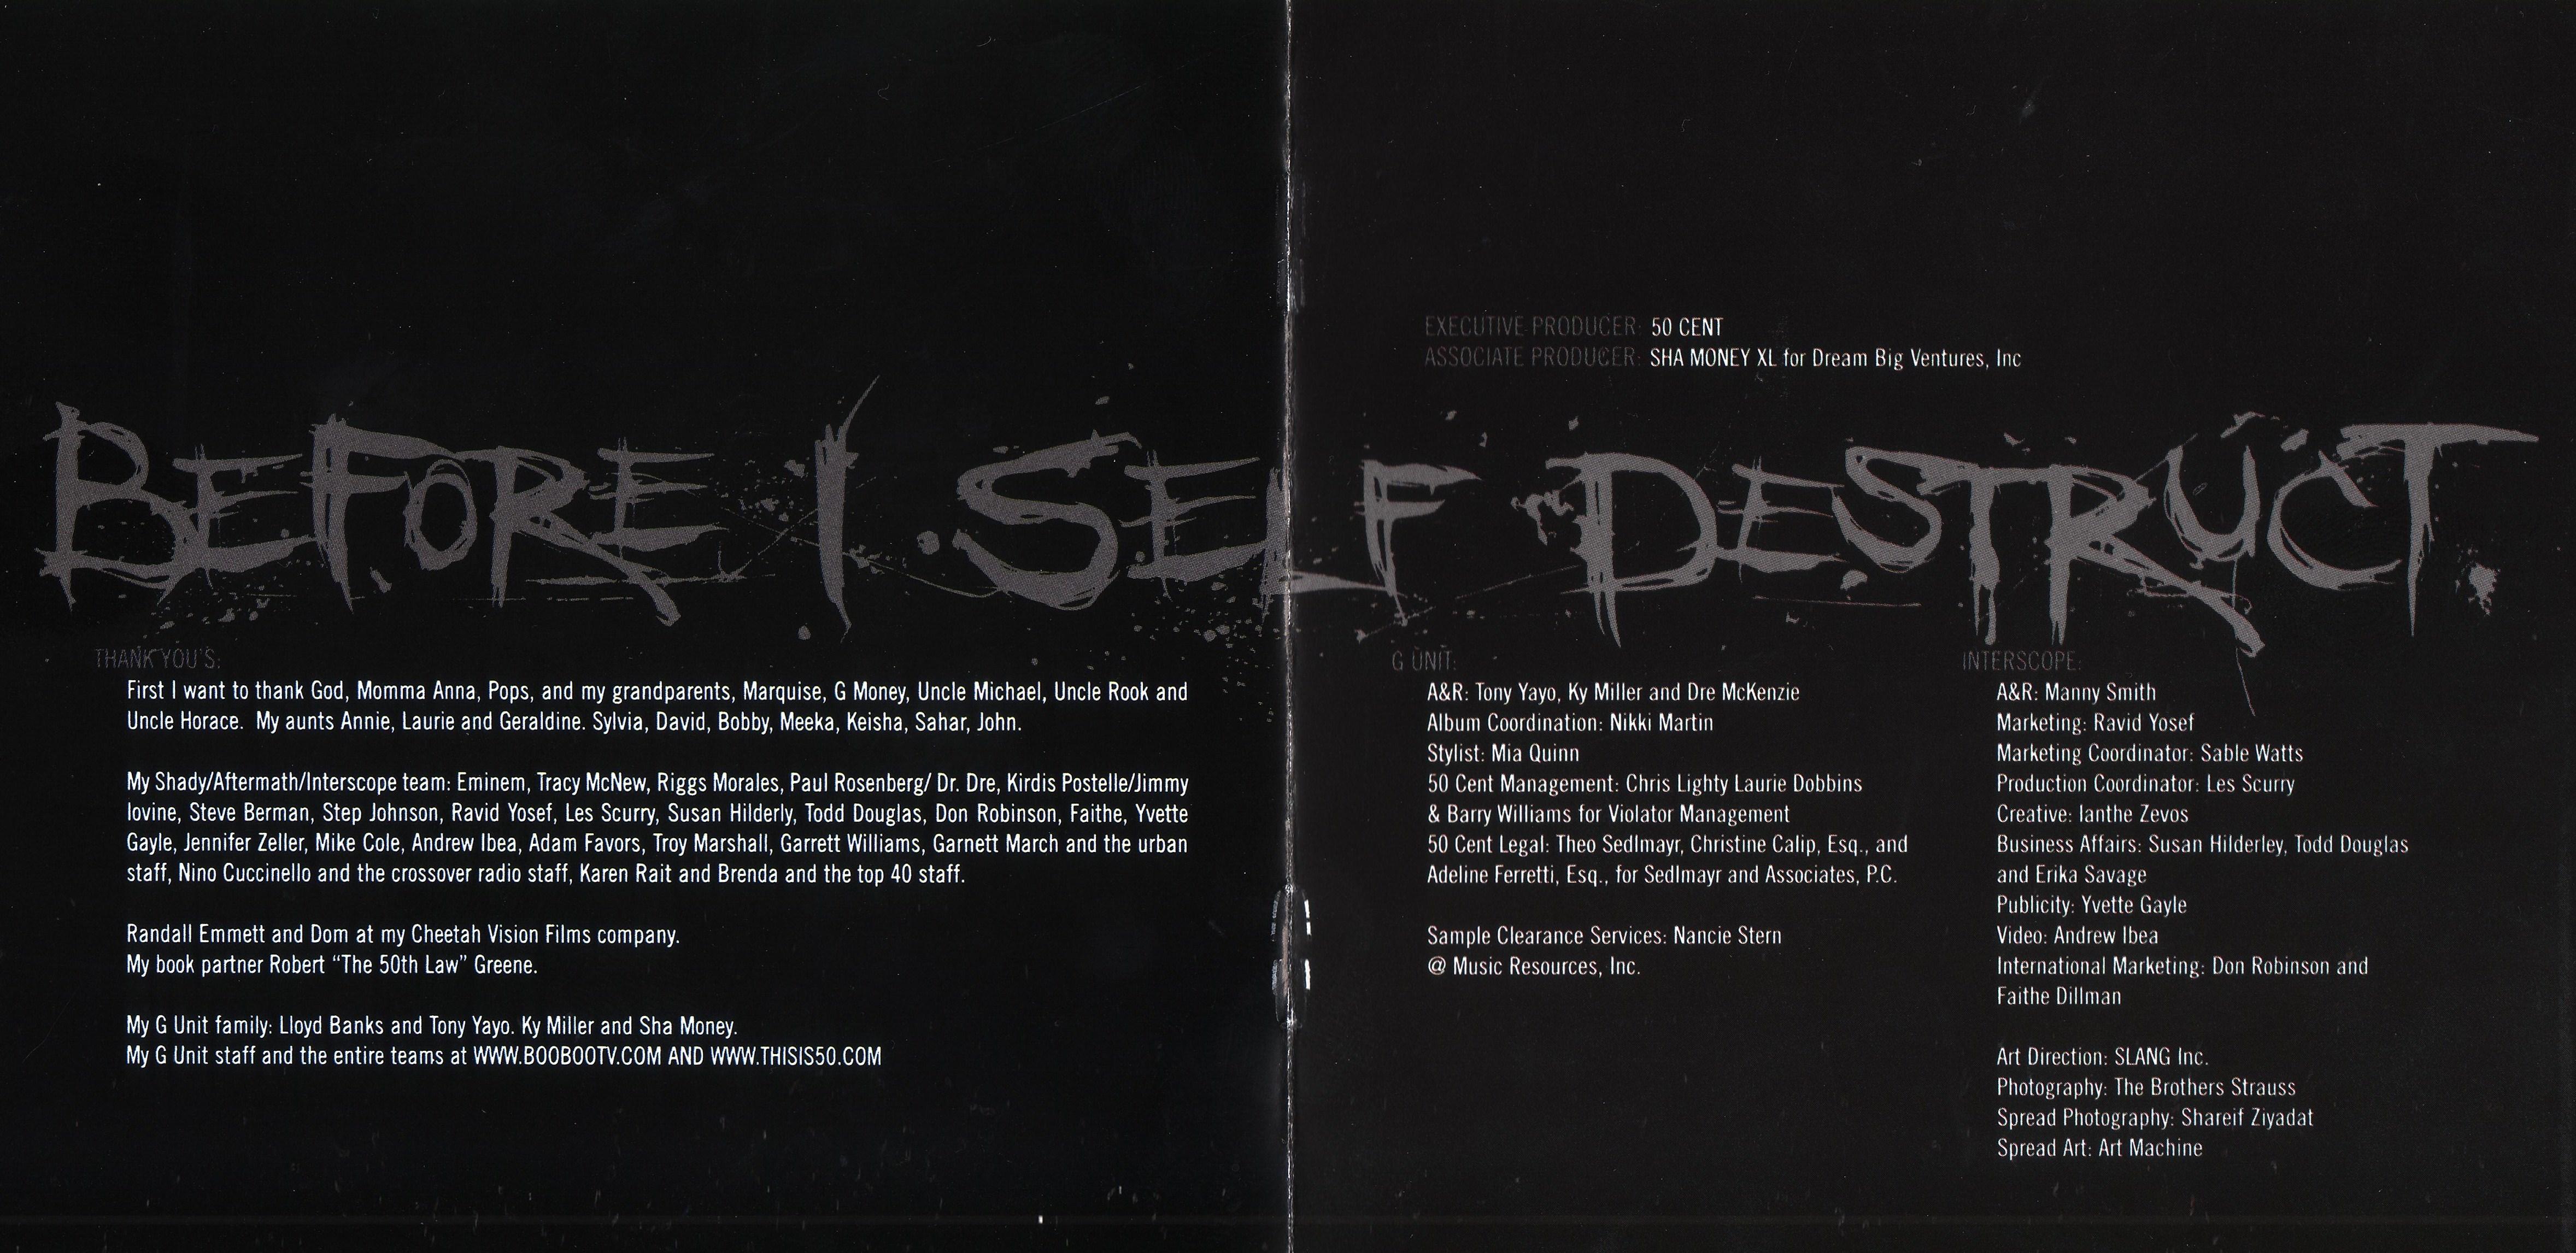 50 Cent Before I Self Destruct Album Cover | www.imgkid ...